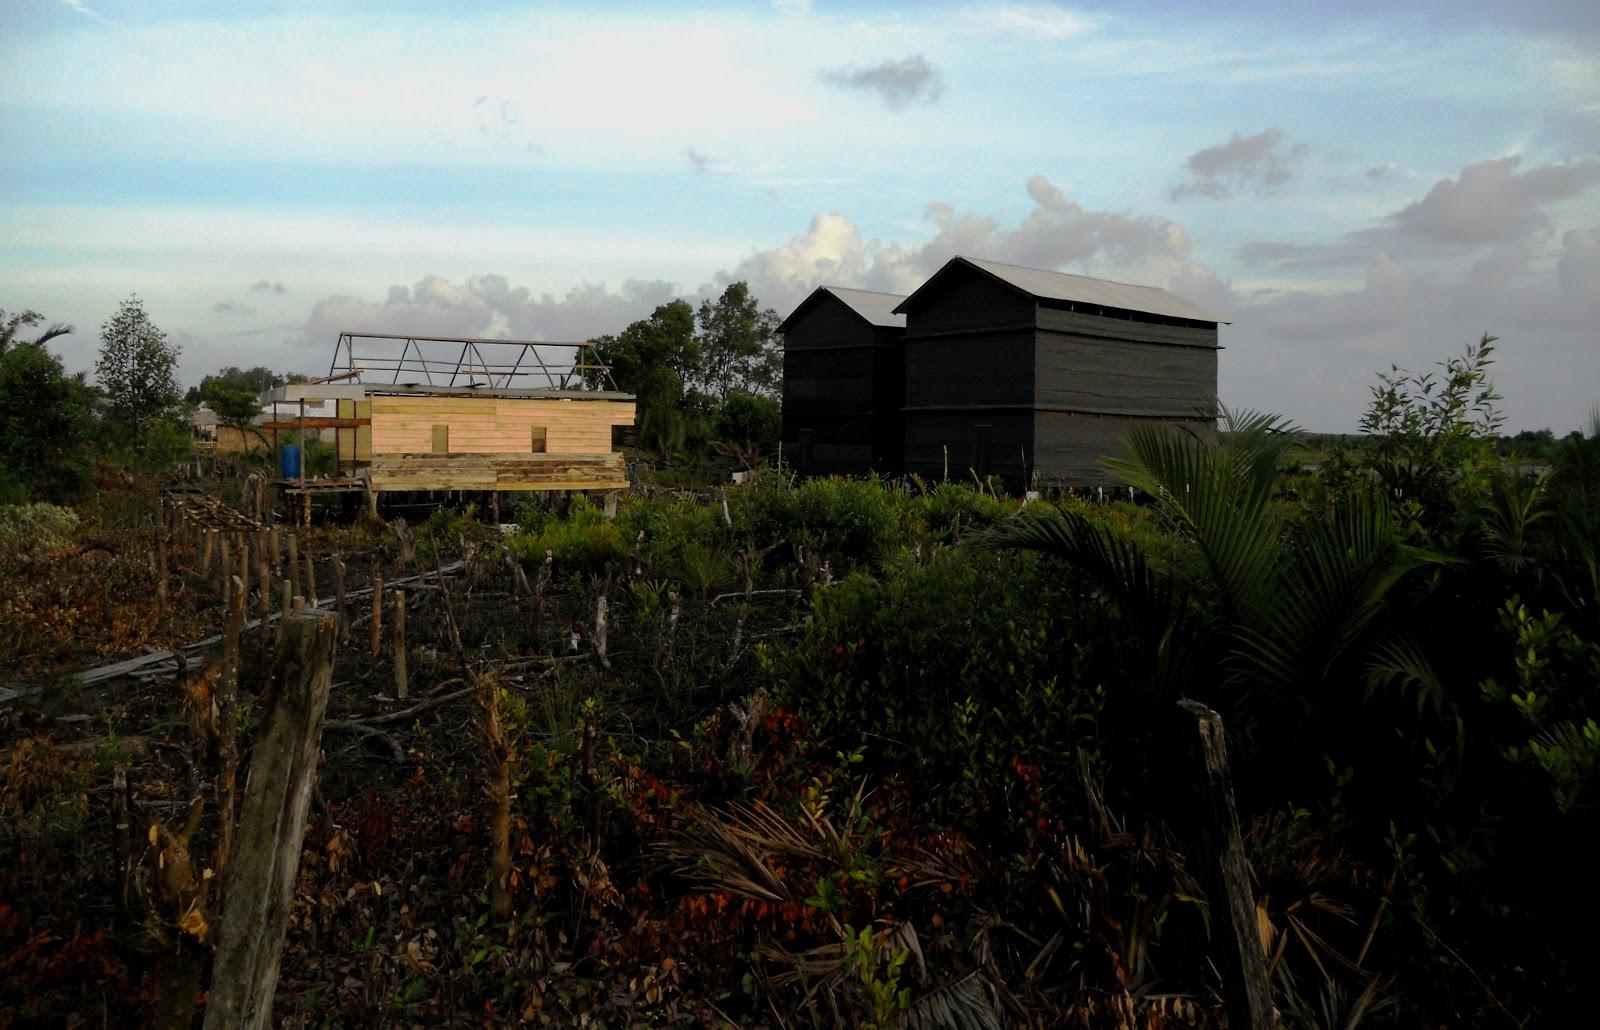 1600 x 1030 · 188 kB · jpeg, Desa Kuala Dua Belas, Kecamatan Tulung ...